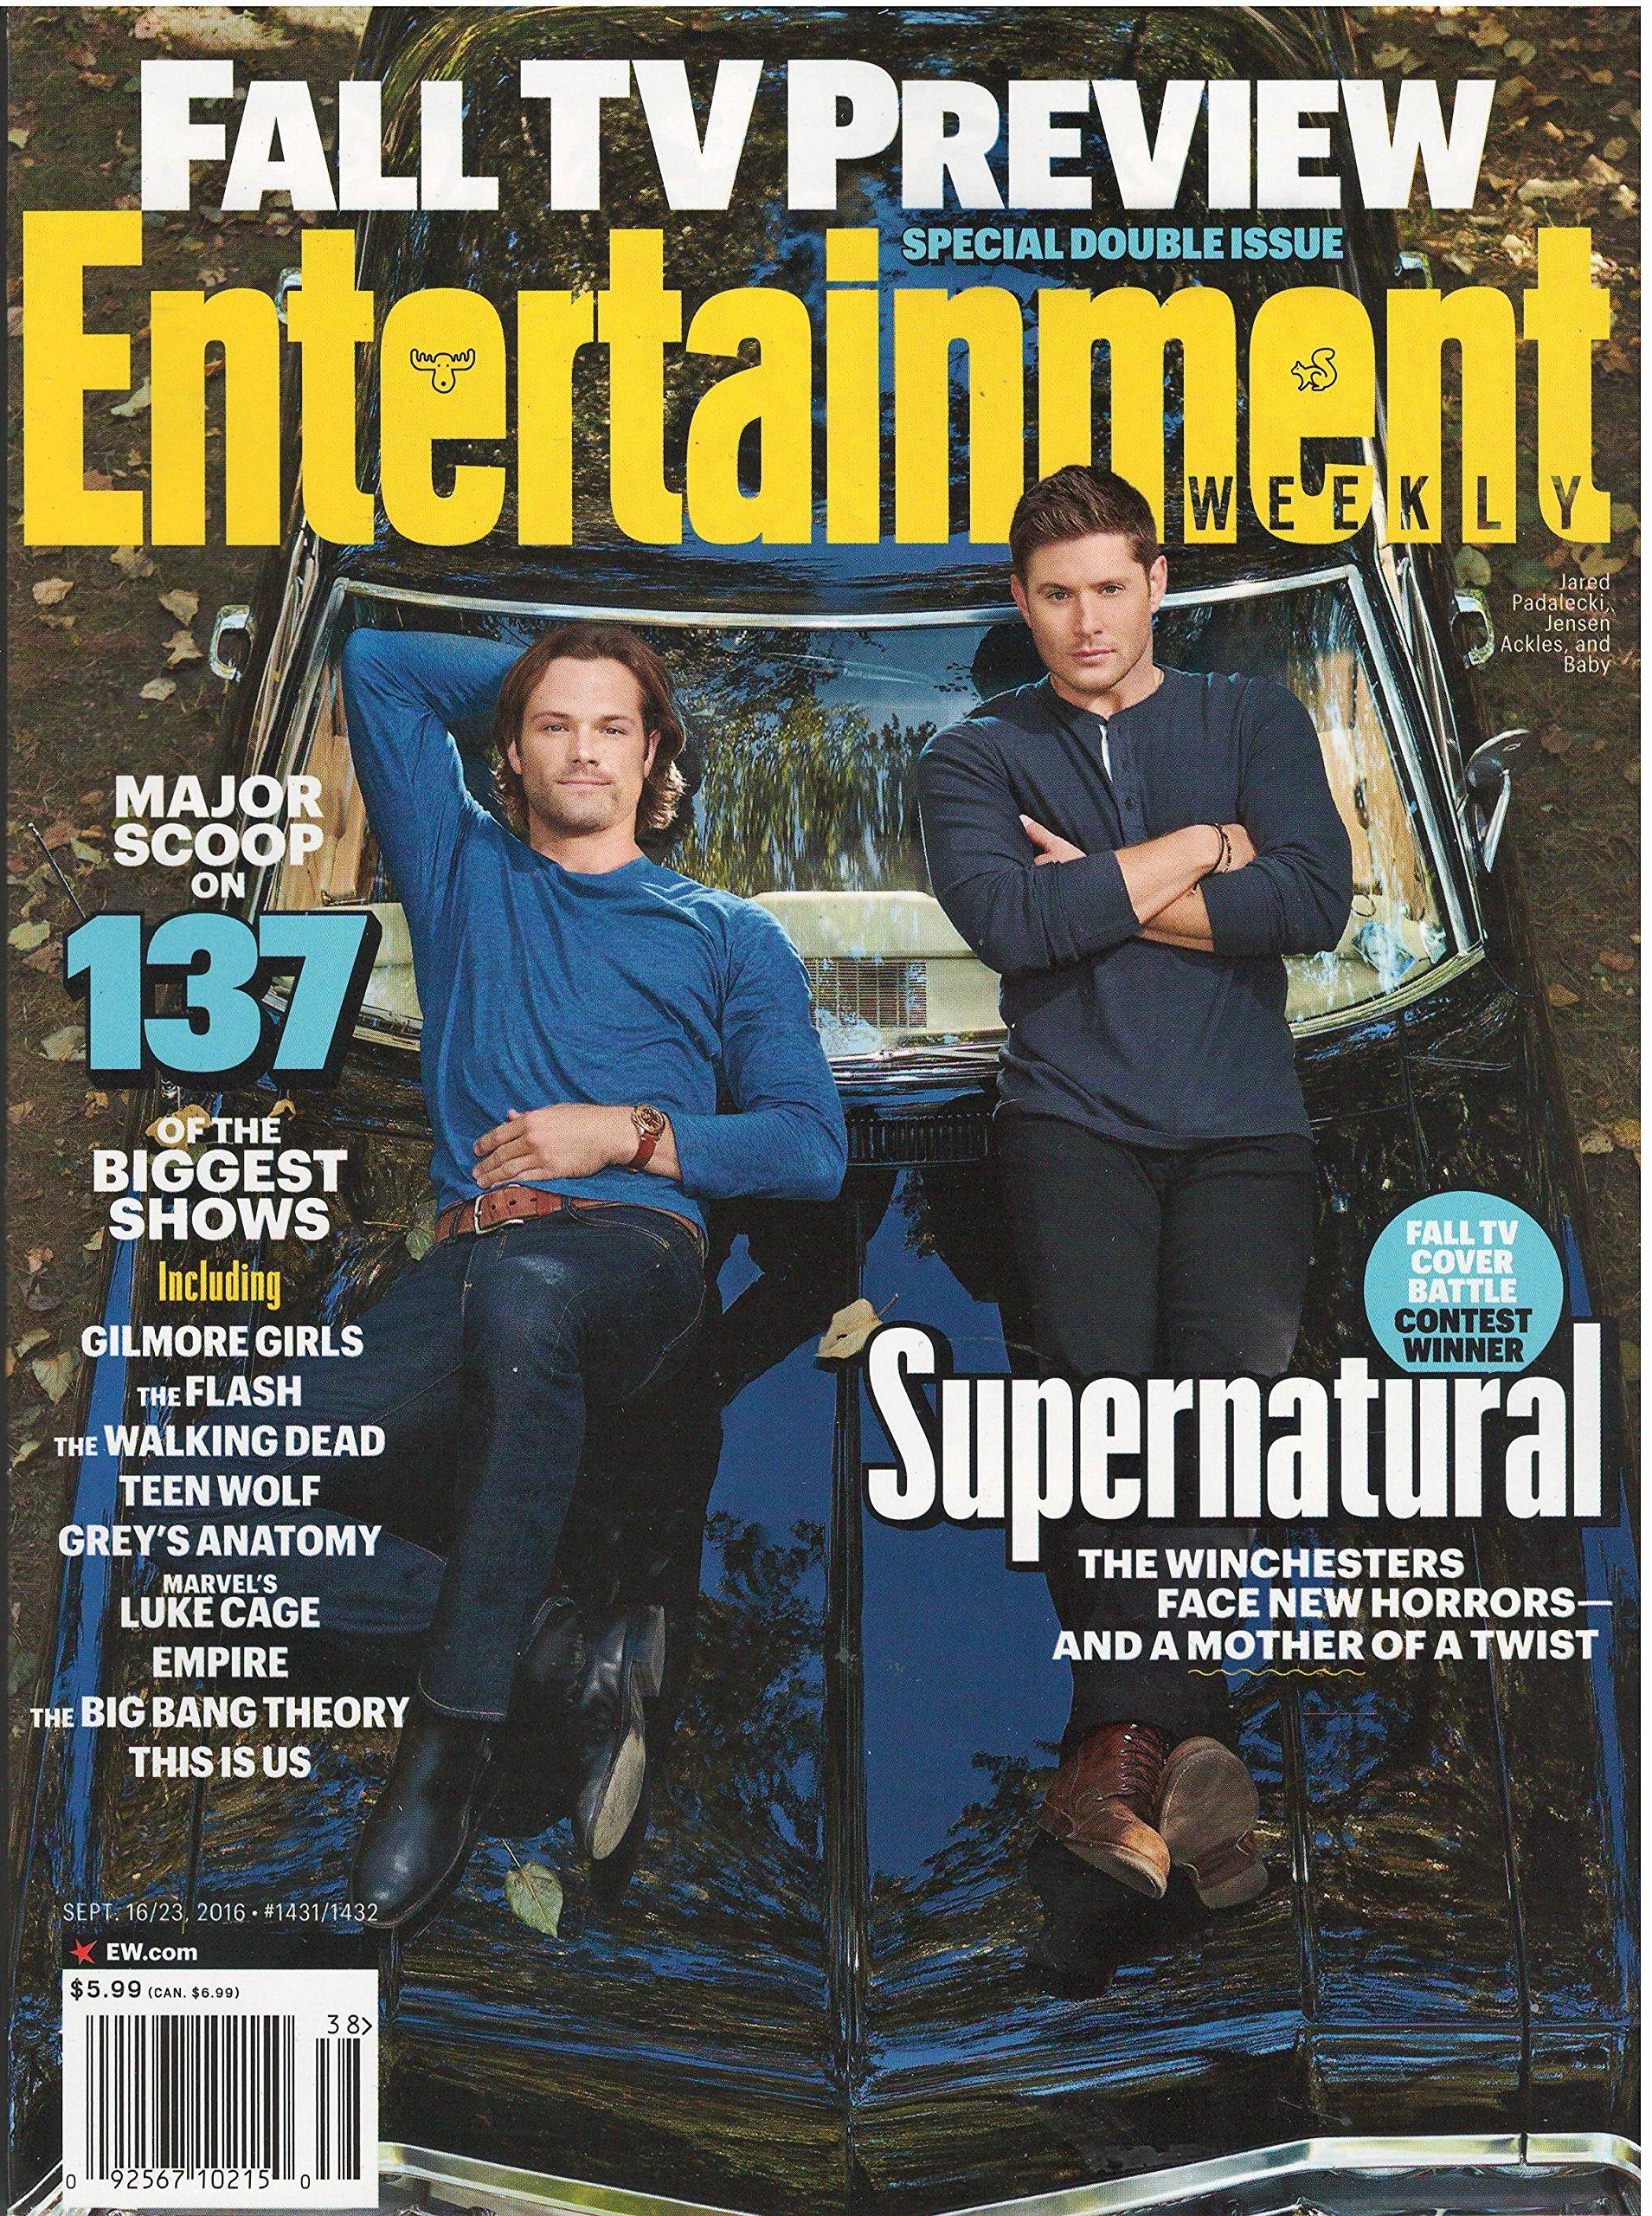 Entertainment Weekly Magazine September 16 - 23 2016 ebook